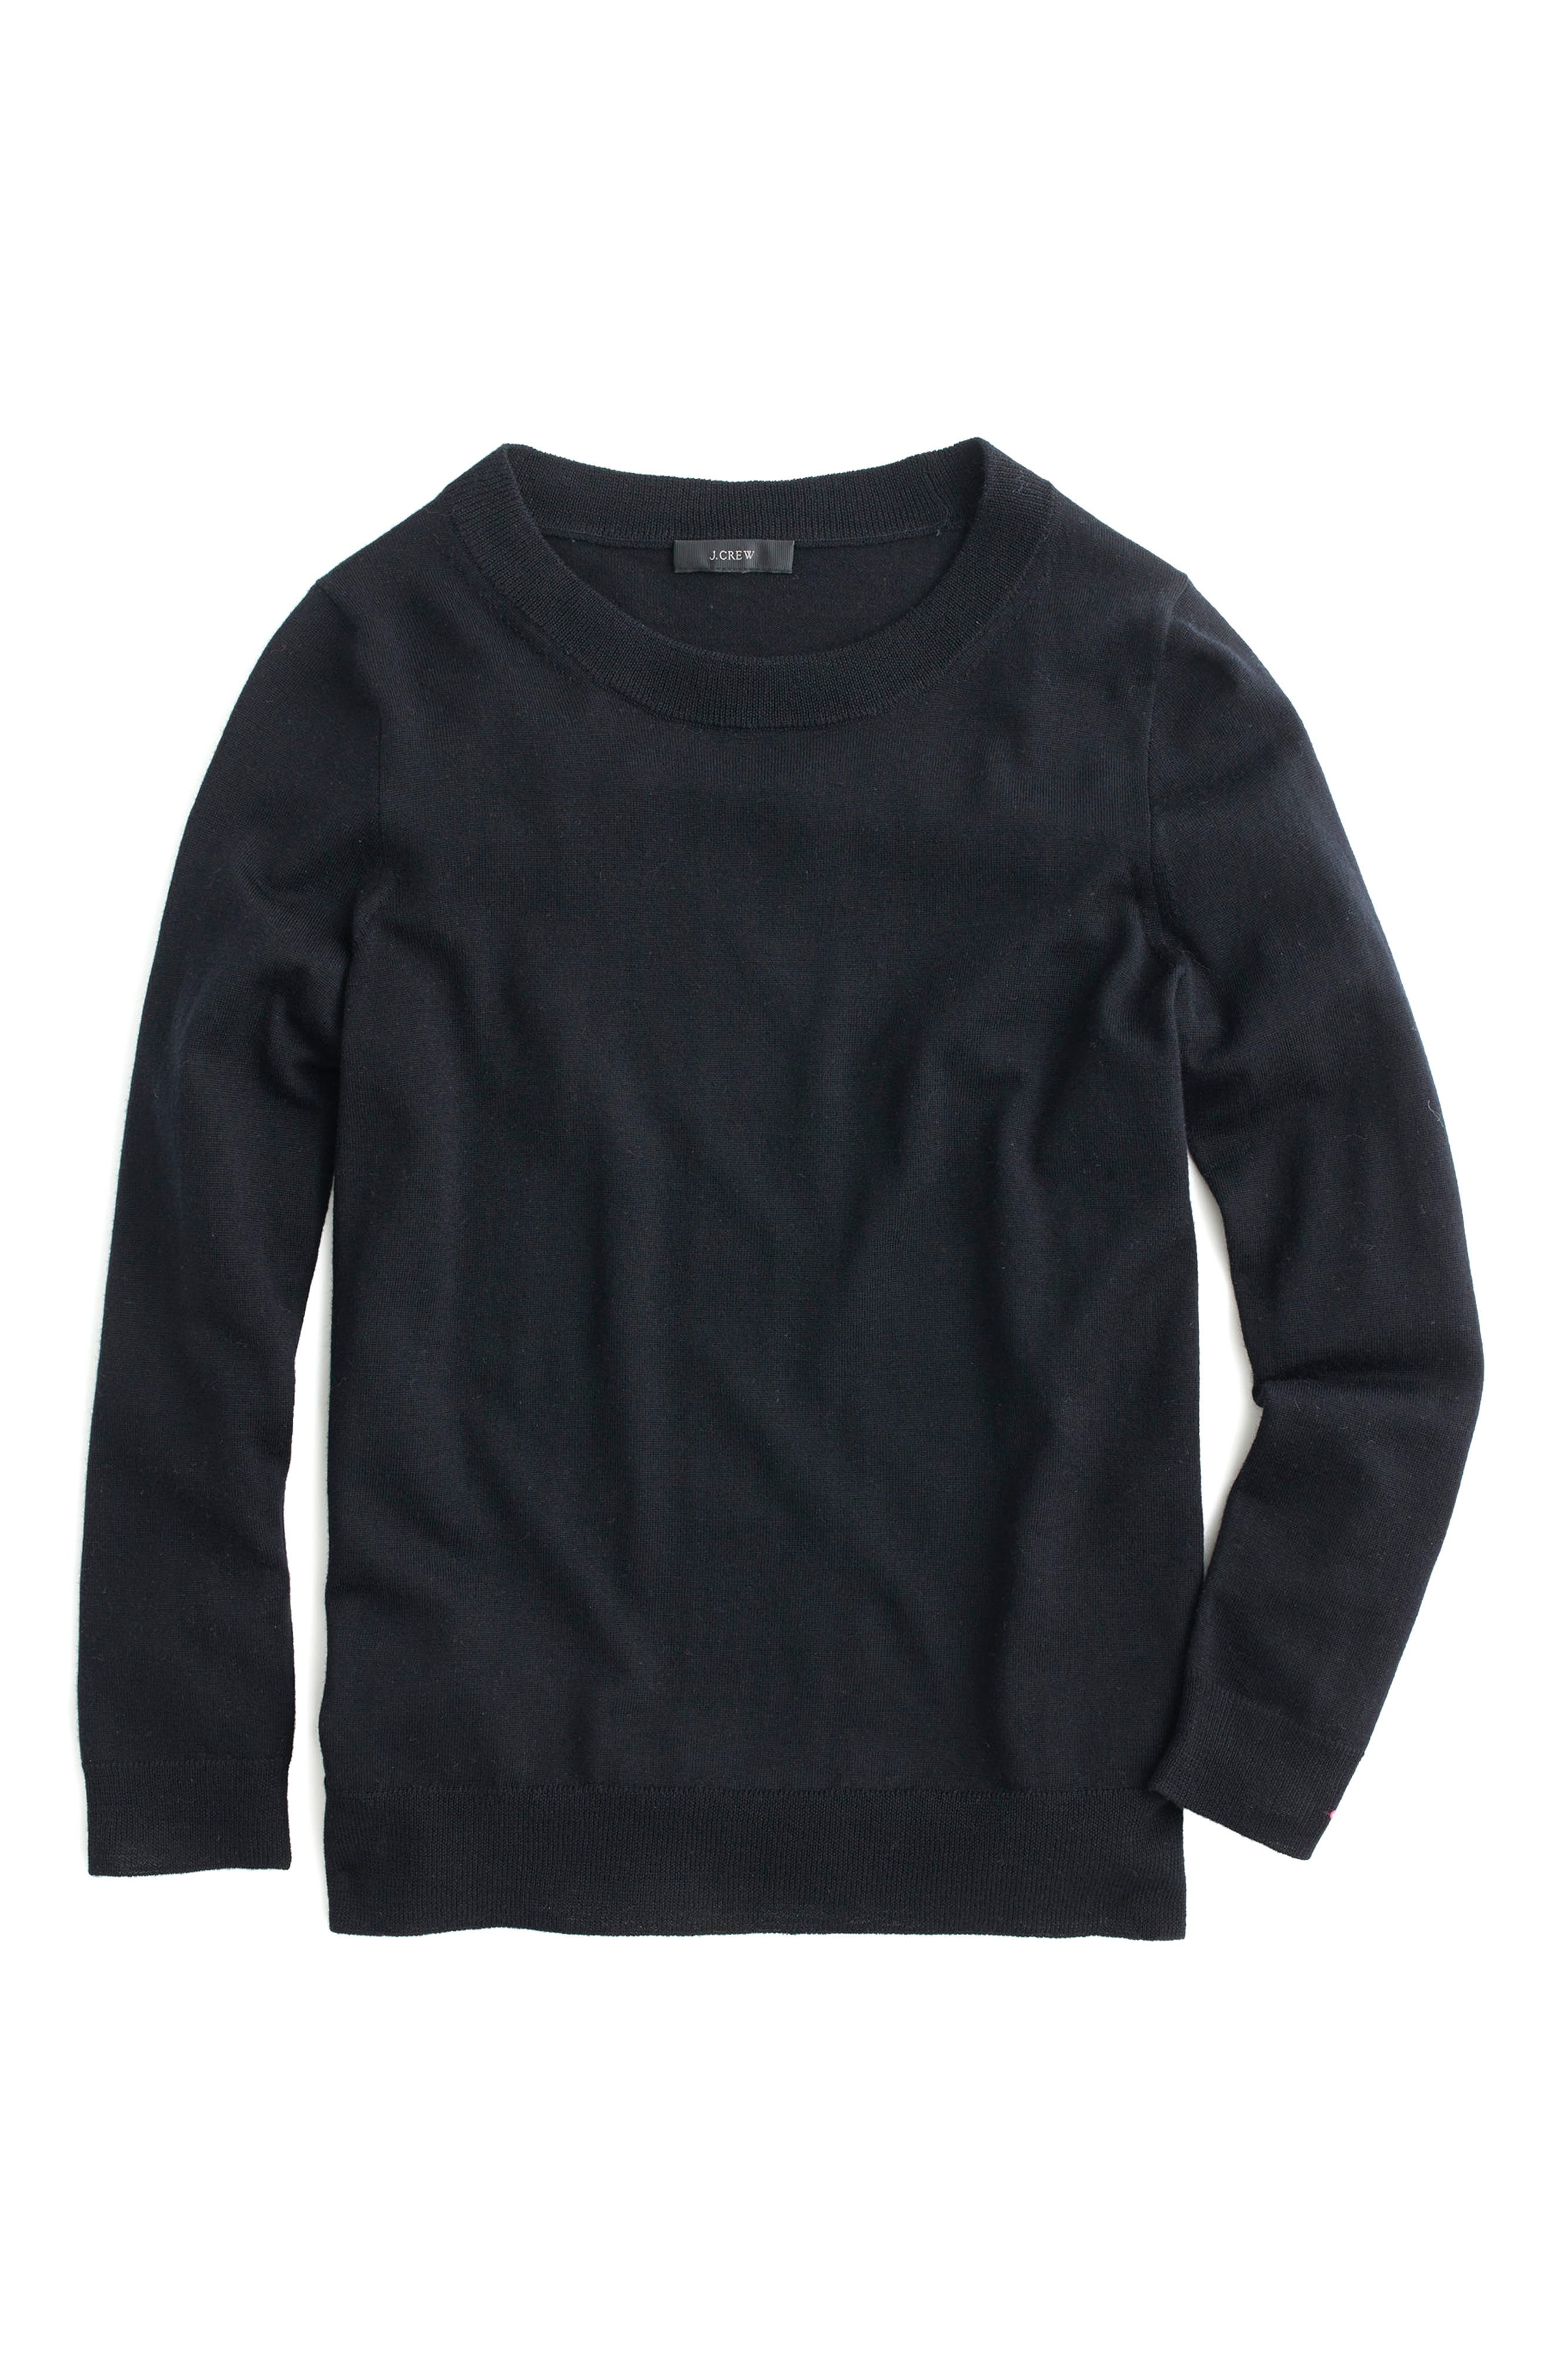 Tippi Merino Wool Sweater,                             Main thumbnail 1, color,                             BLACK